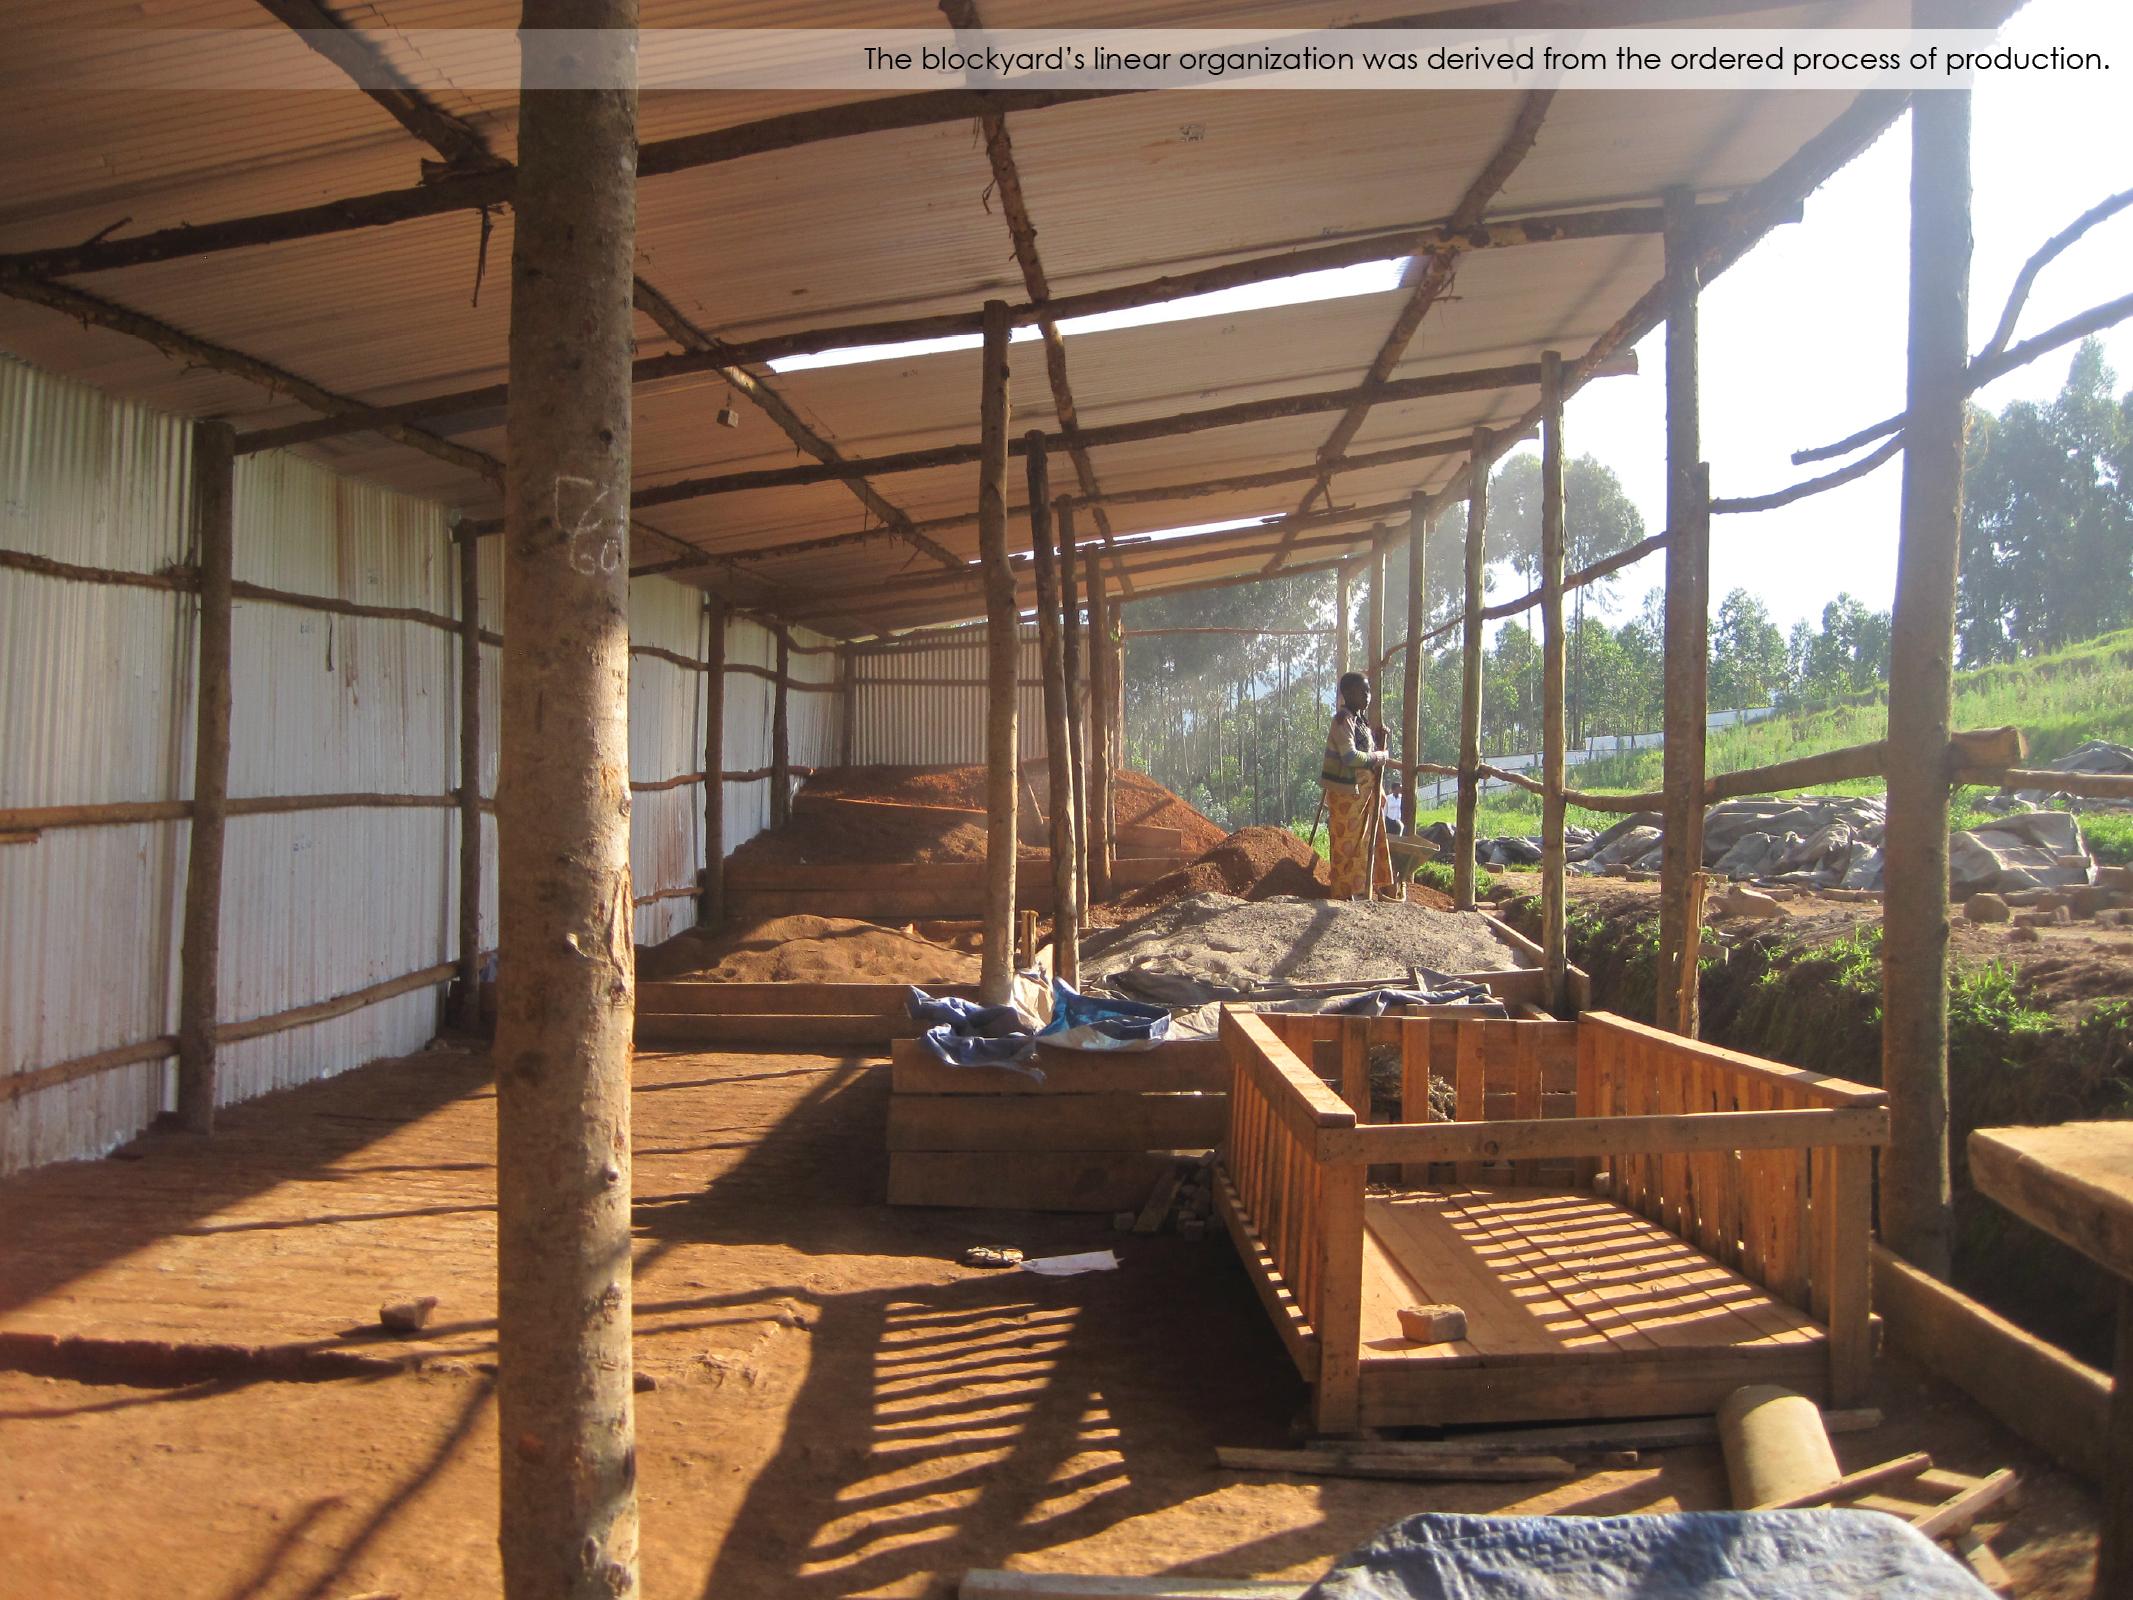 Gaugler_RwandaExperience_p7.jpg